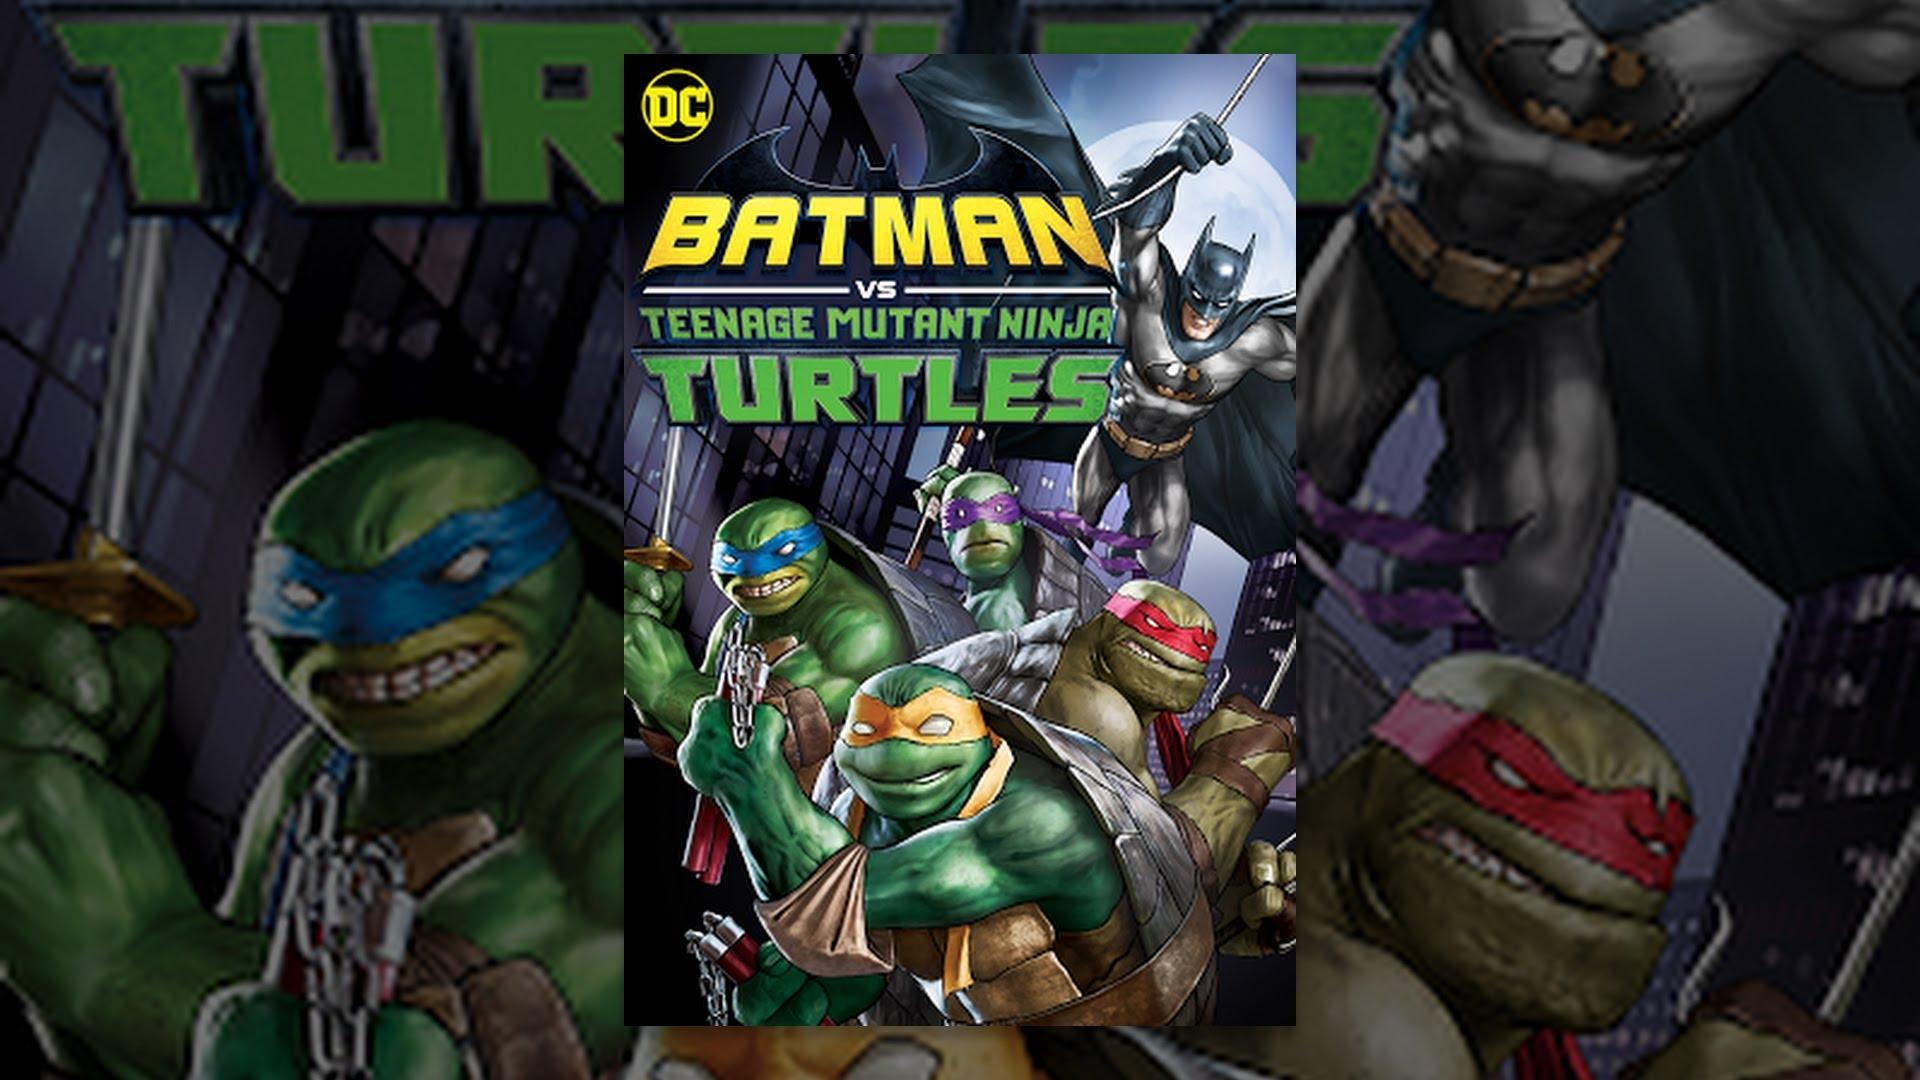 Download Batman vs. Teenage Mutant Ninja Turtles